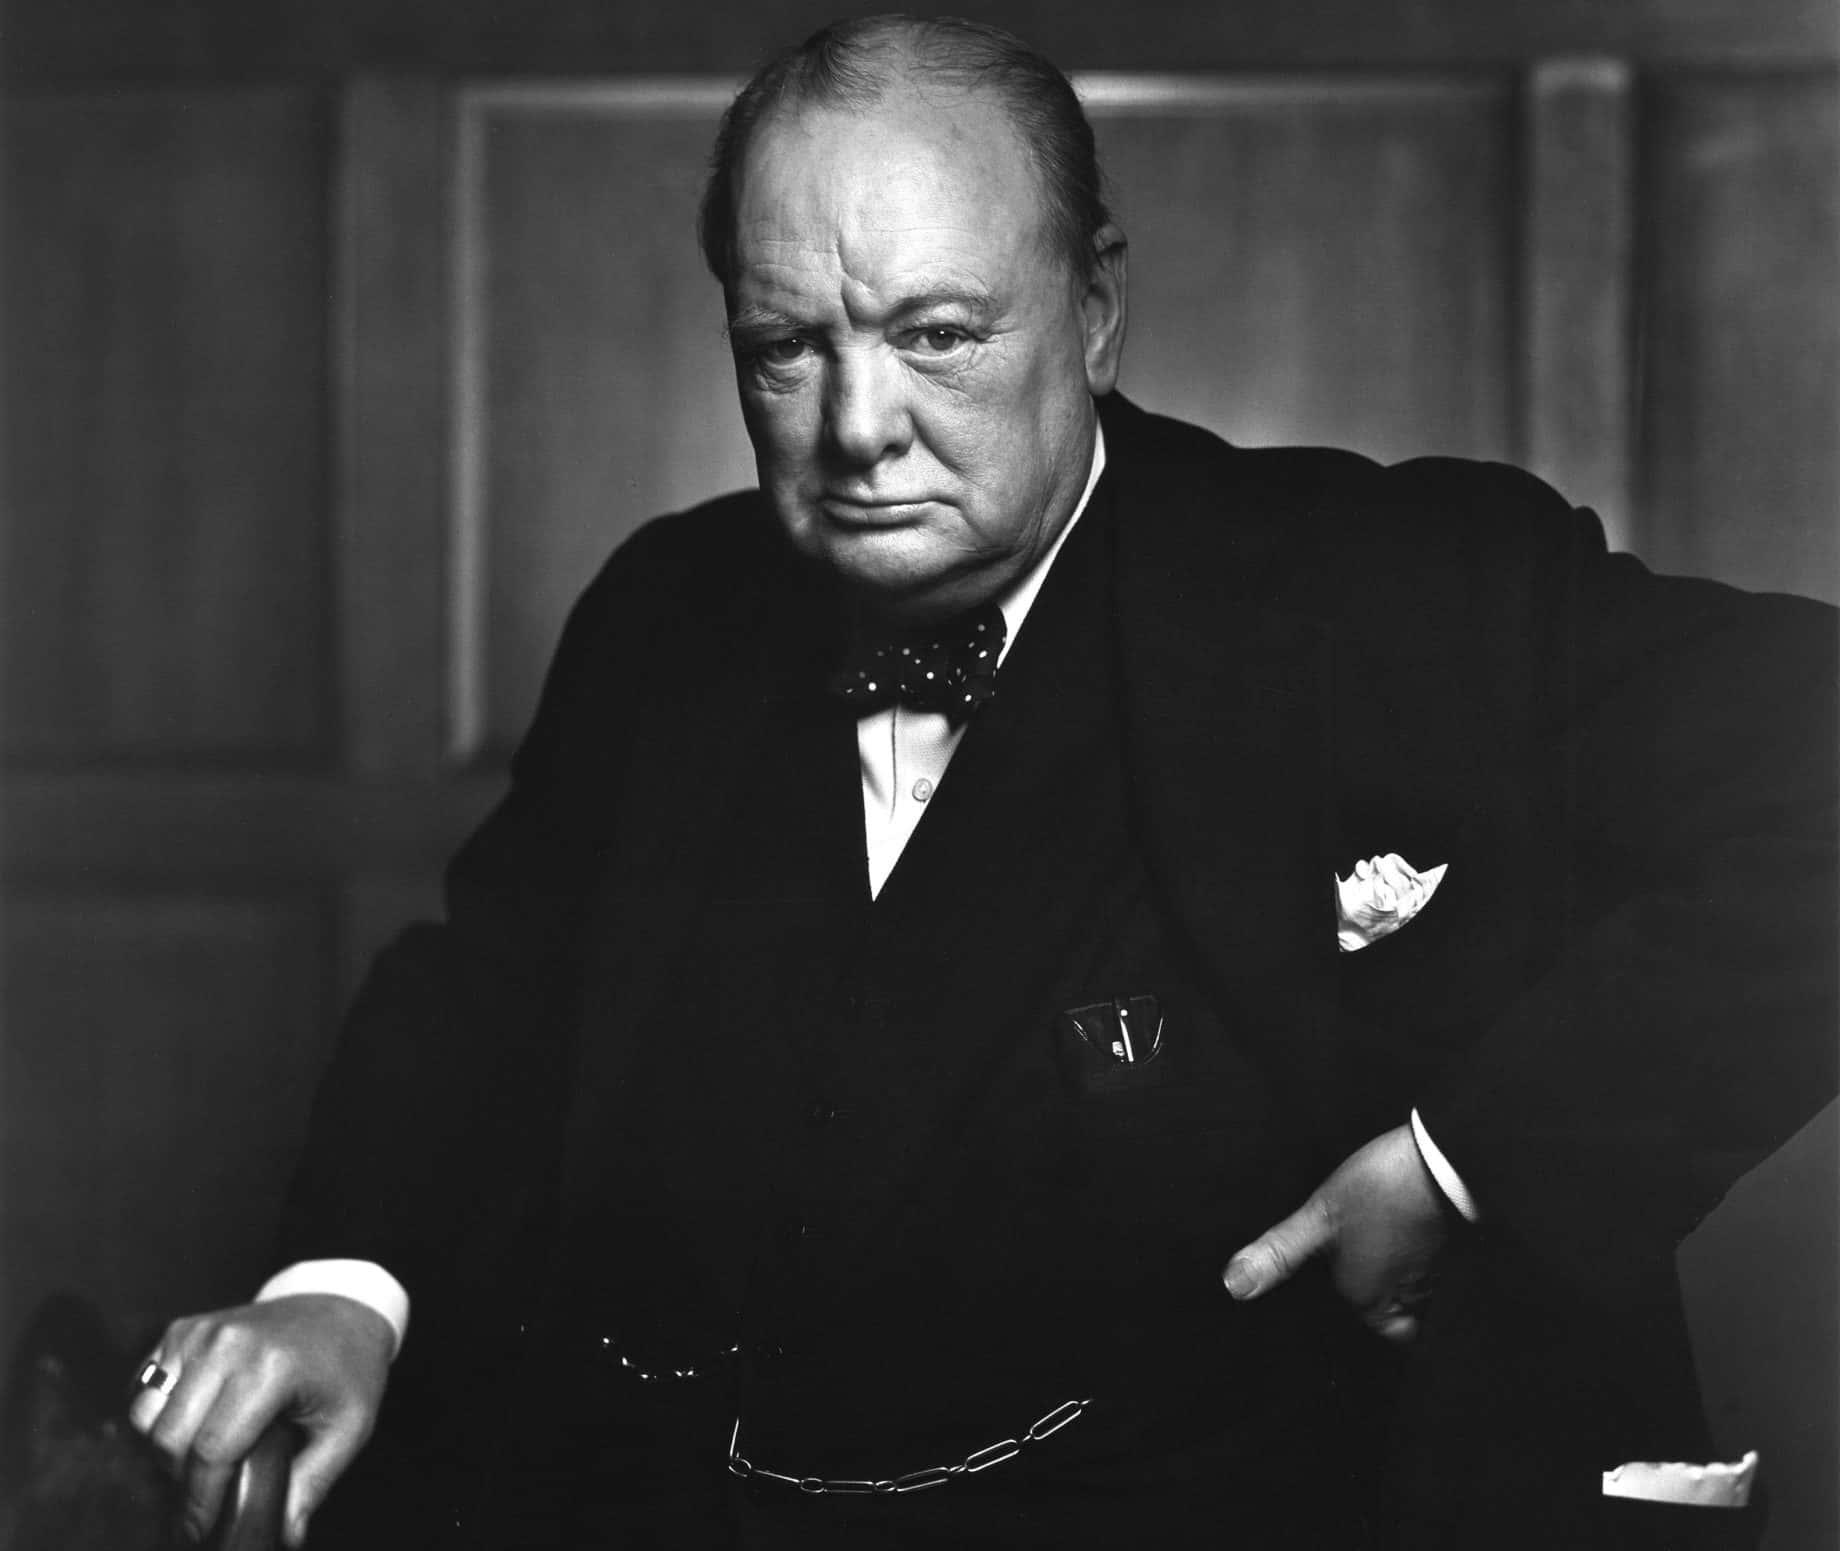 Winston Churchill facts